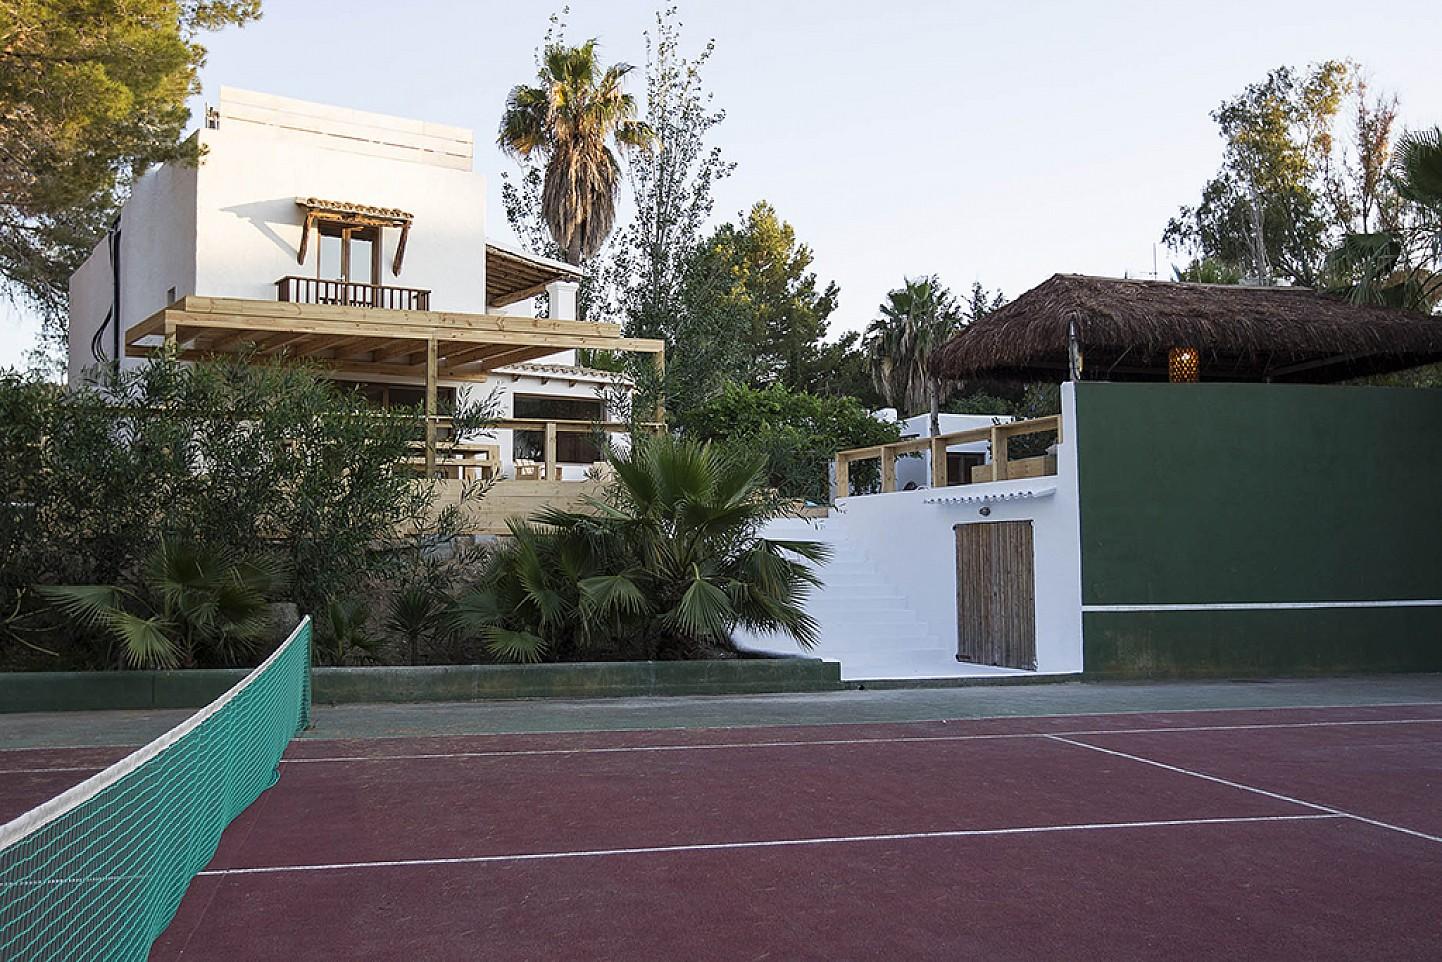 Fabulosa pista de tenis